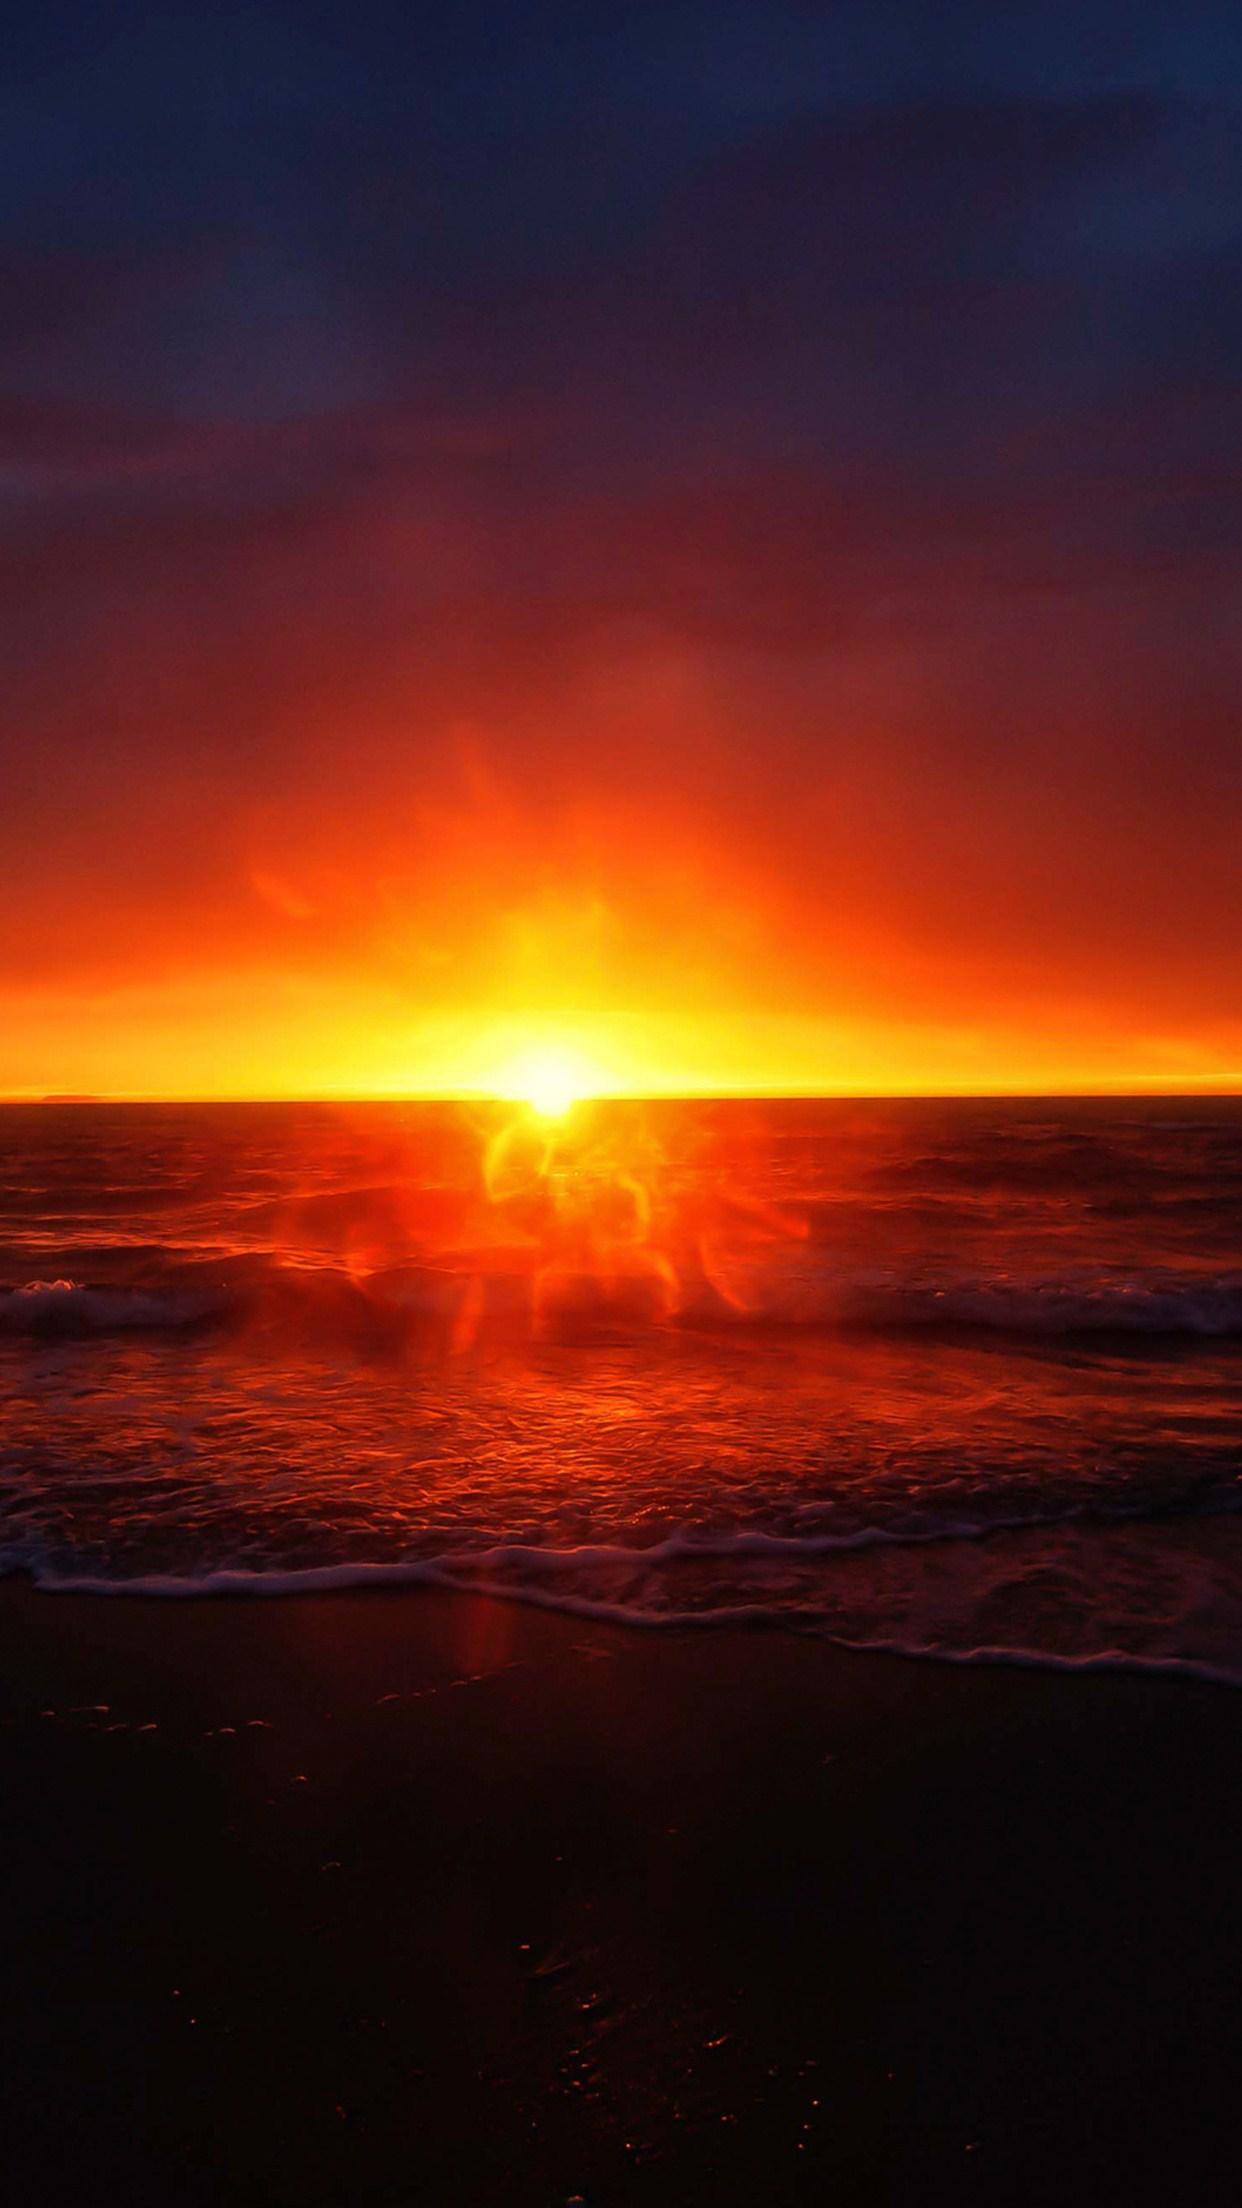 sunset 1 3Wallpapers iPhone Parallax Sunset (3)